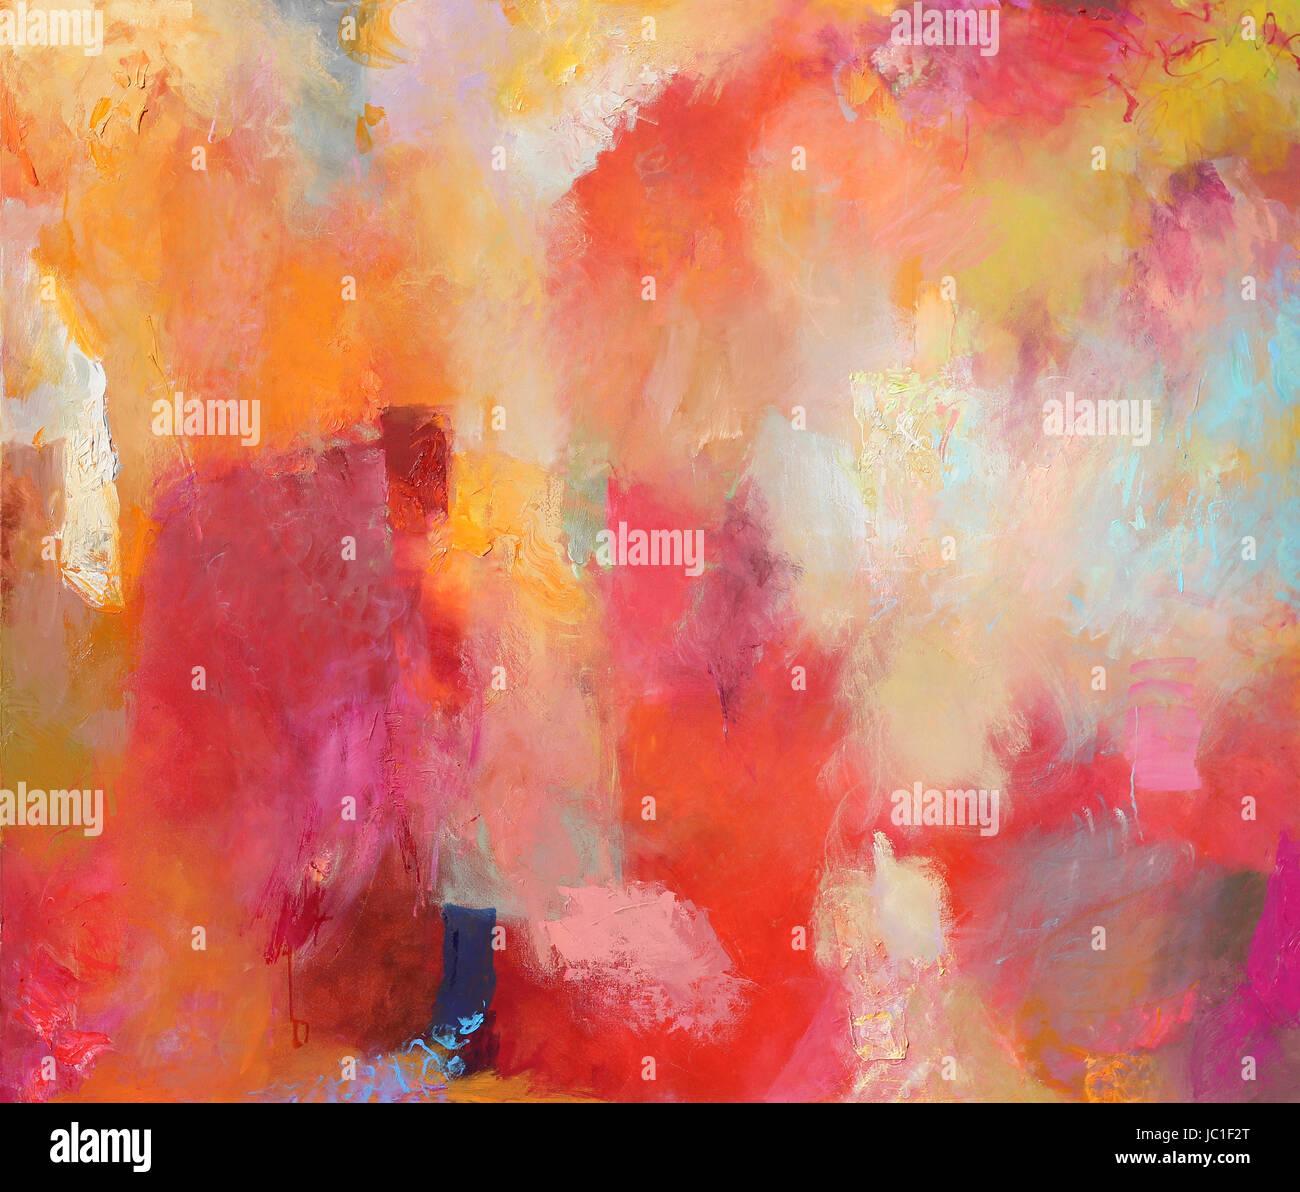 abstract art - hand painted canvas - malerei mischtechnik bunt - Stock Image